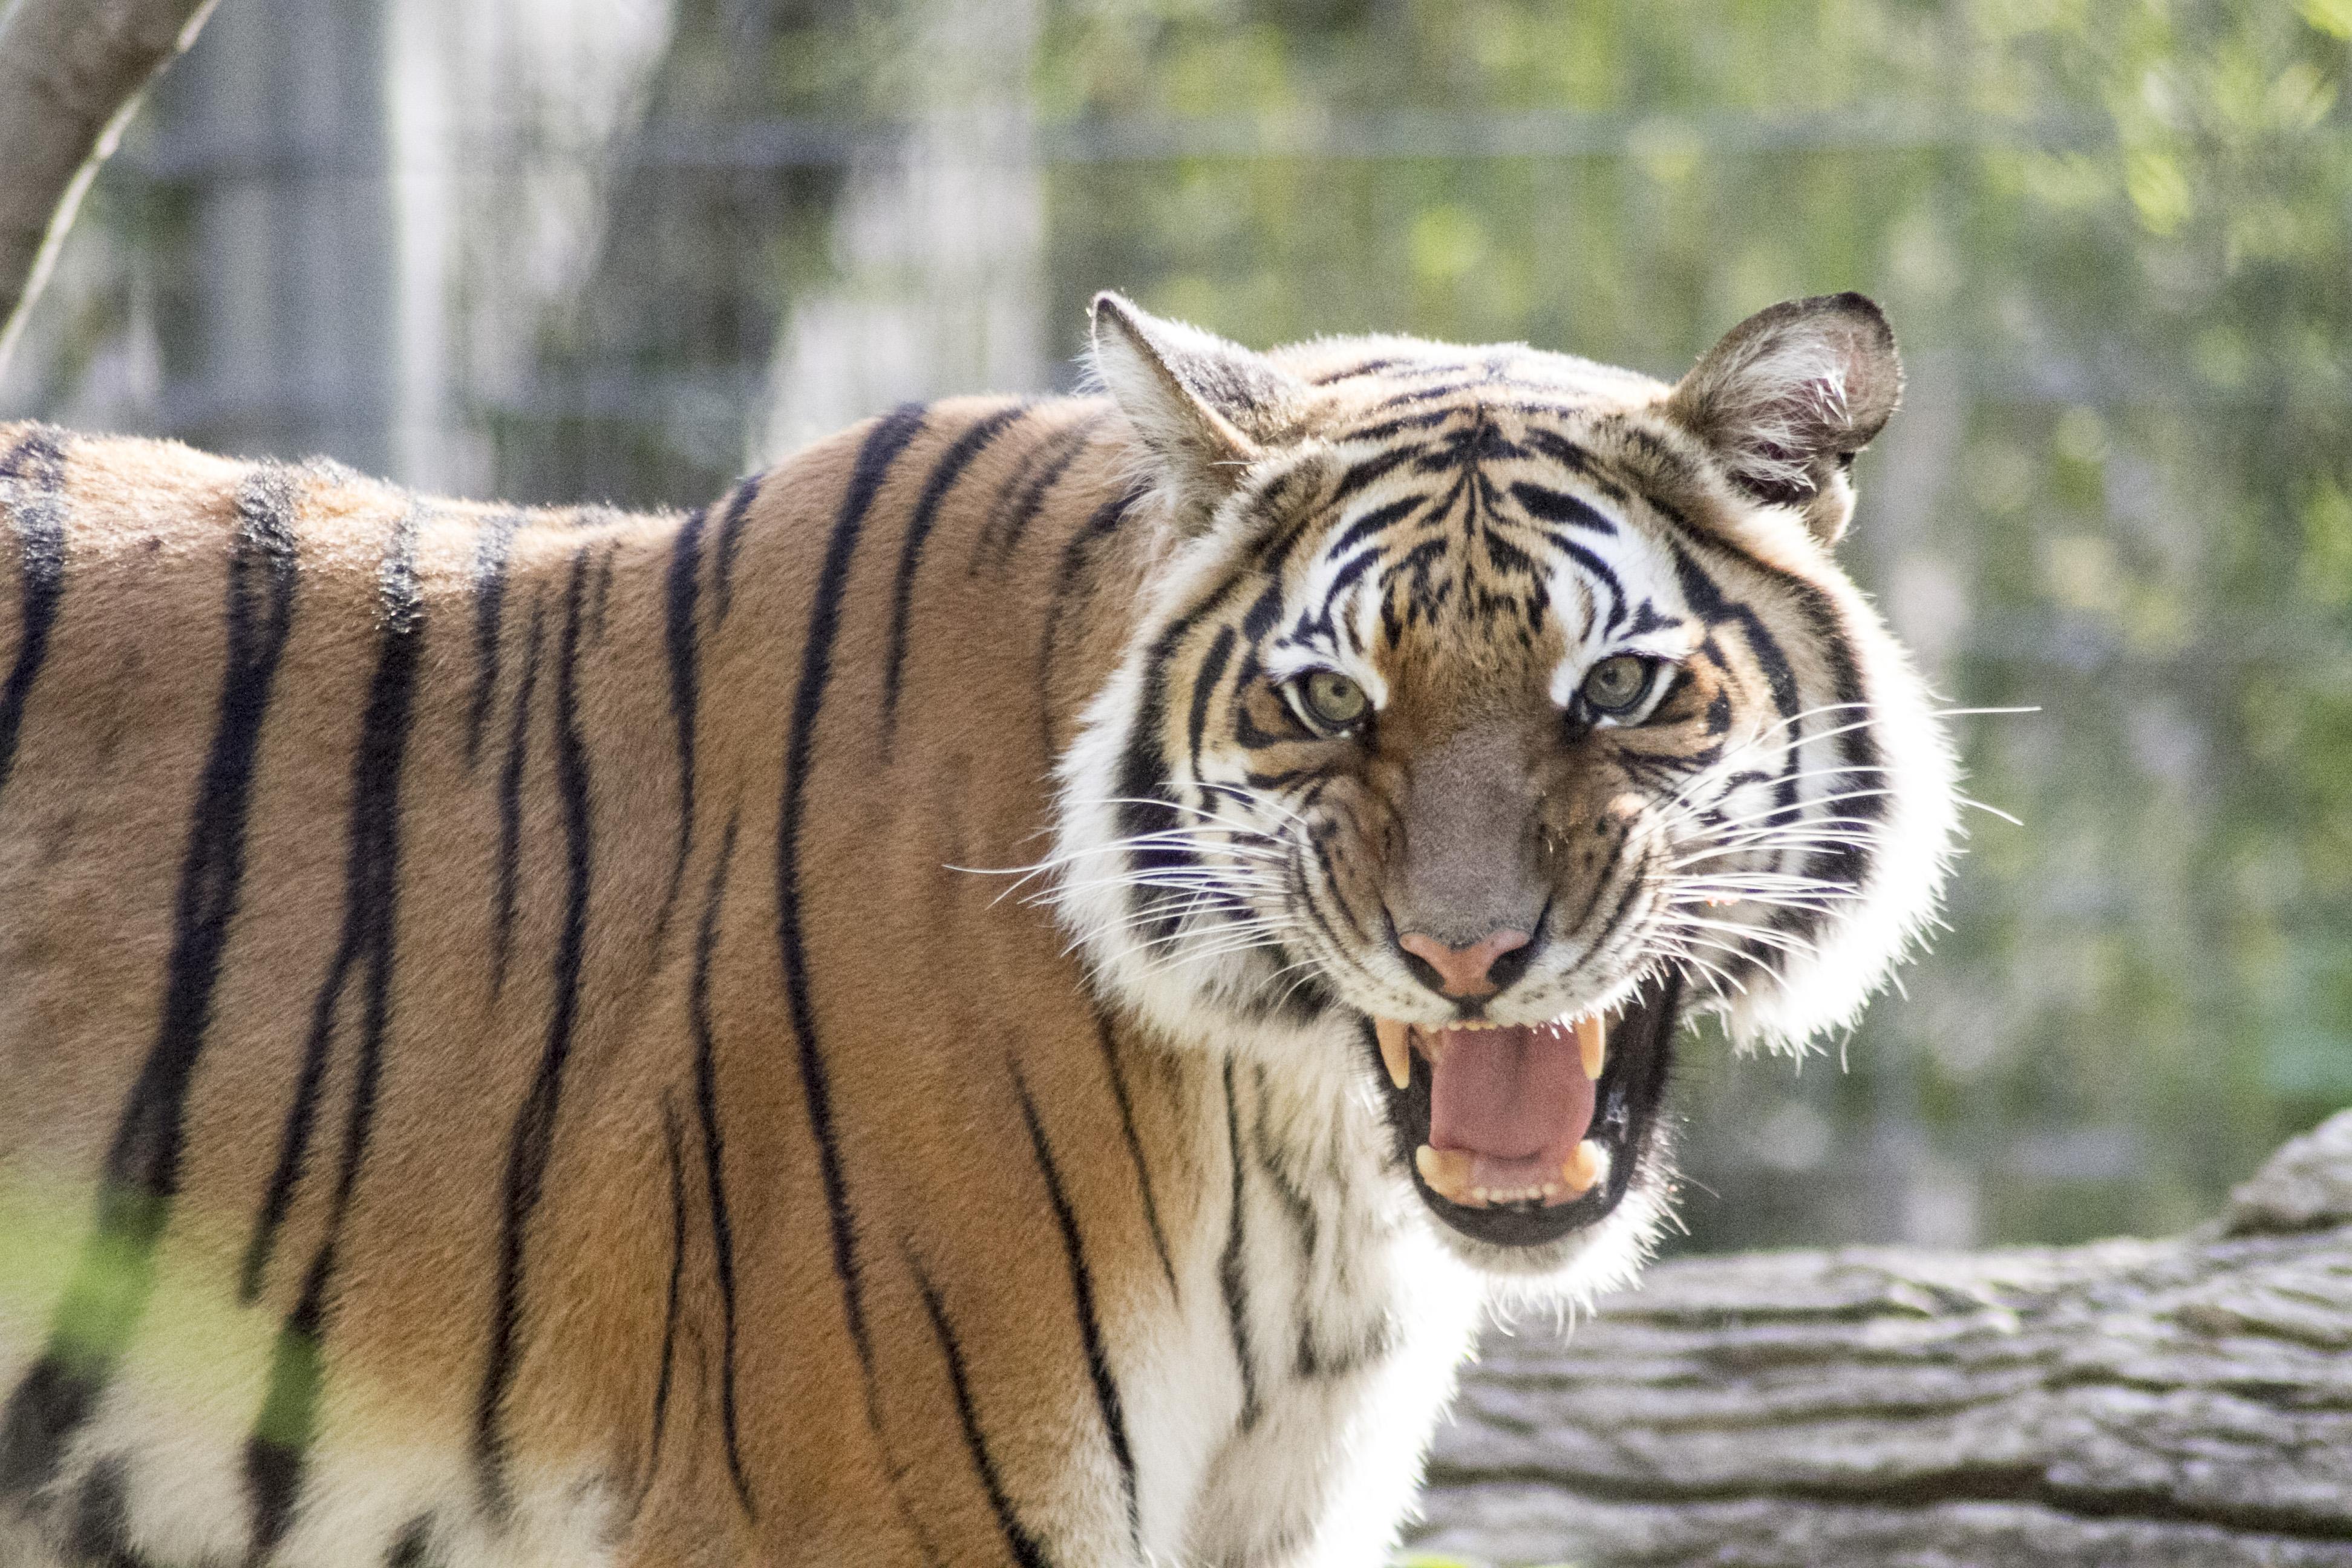 Malayan Tiger - Fresno Chaffee Zoo on amur tiger map, sumatran tiger map, dhole map, african tiger map, indochinese tiger map, chinese tiger map, caspian tiger map, tiger habitat map, golden tiger map, south china tiger map, malayn tiger map, asiatic cheetah map,